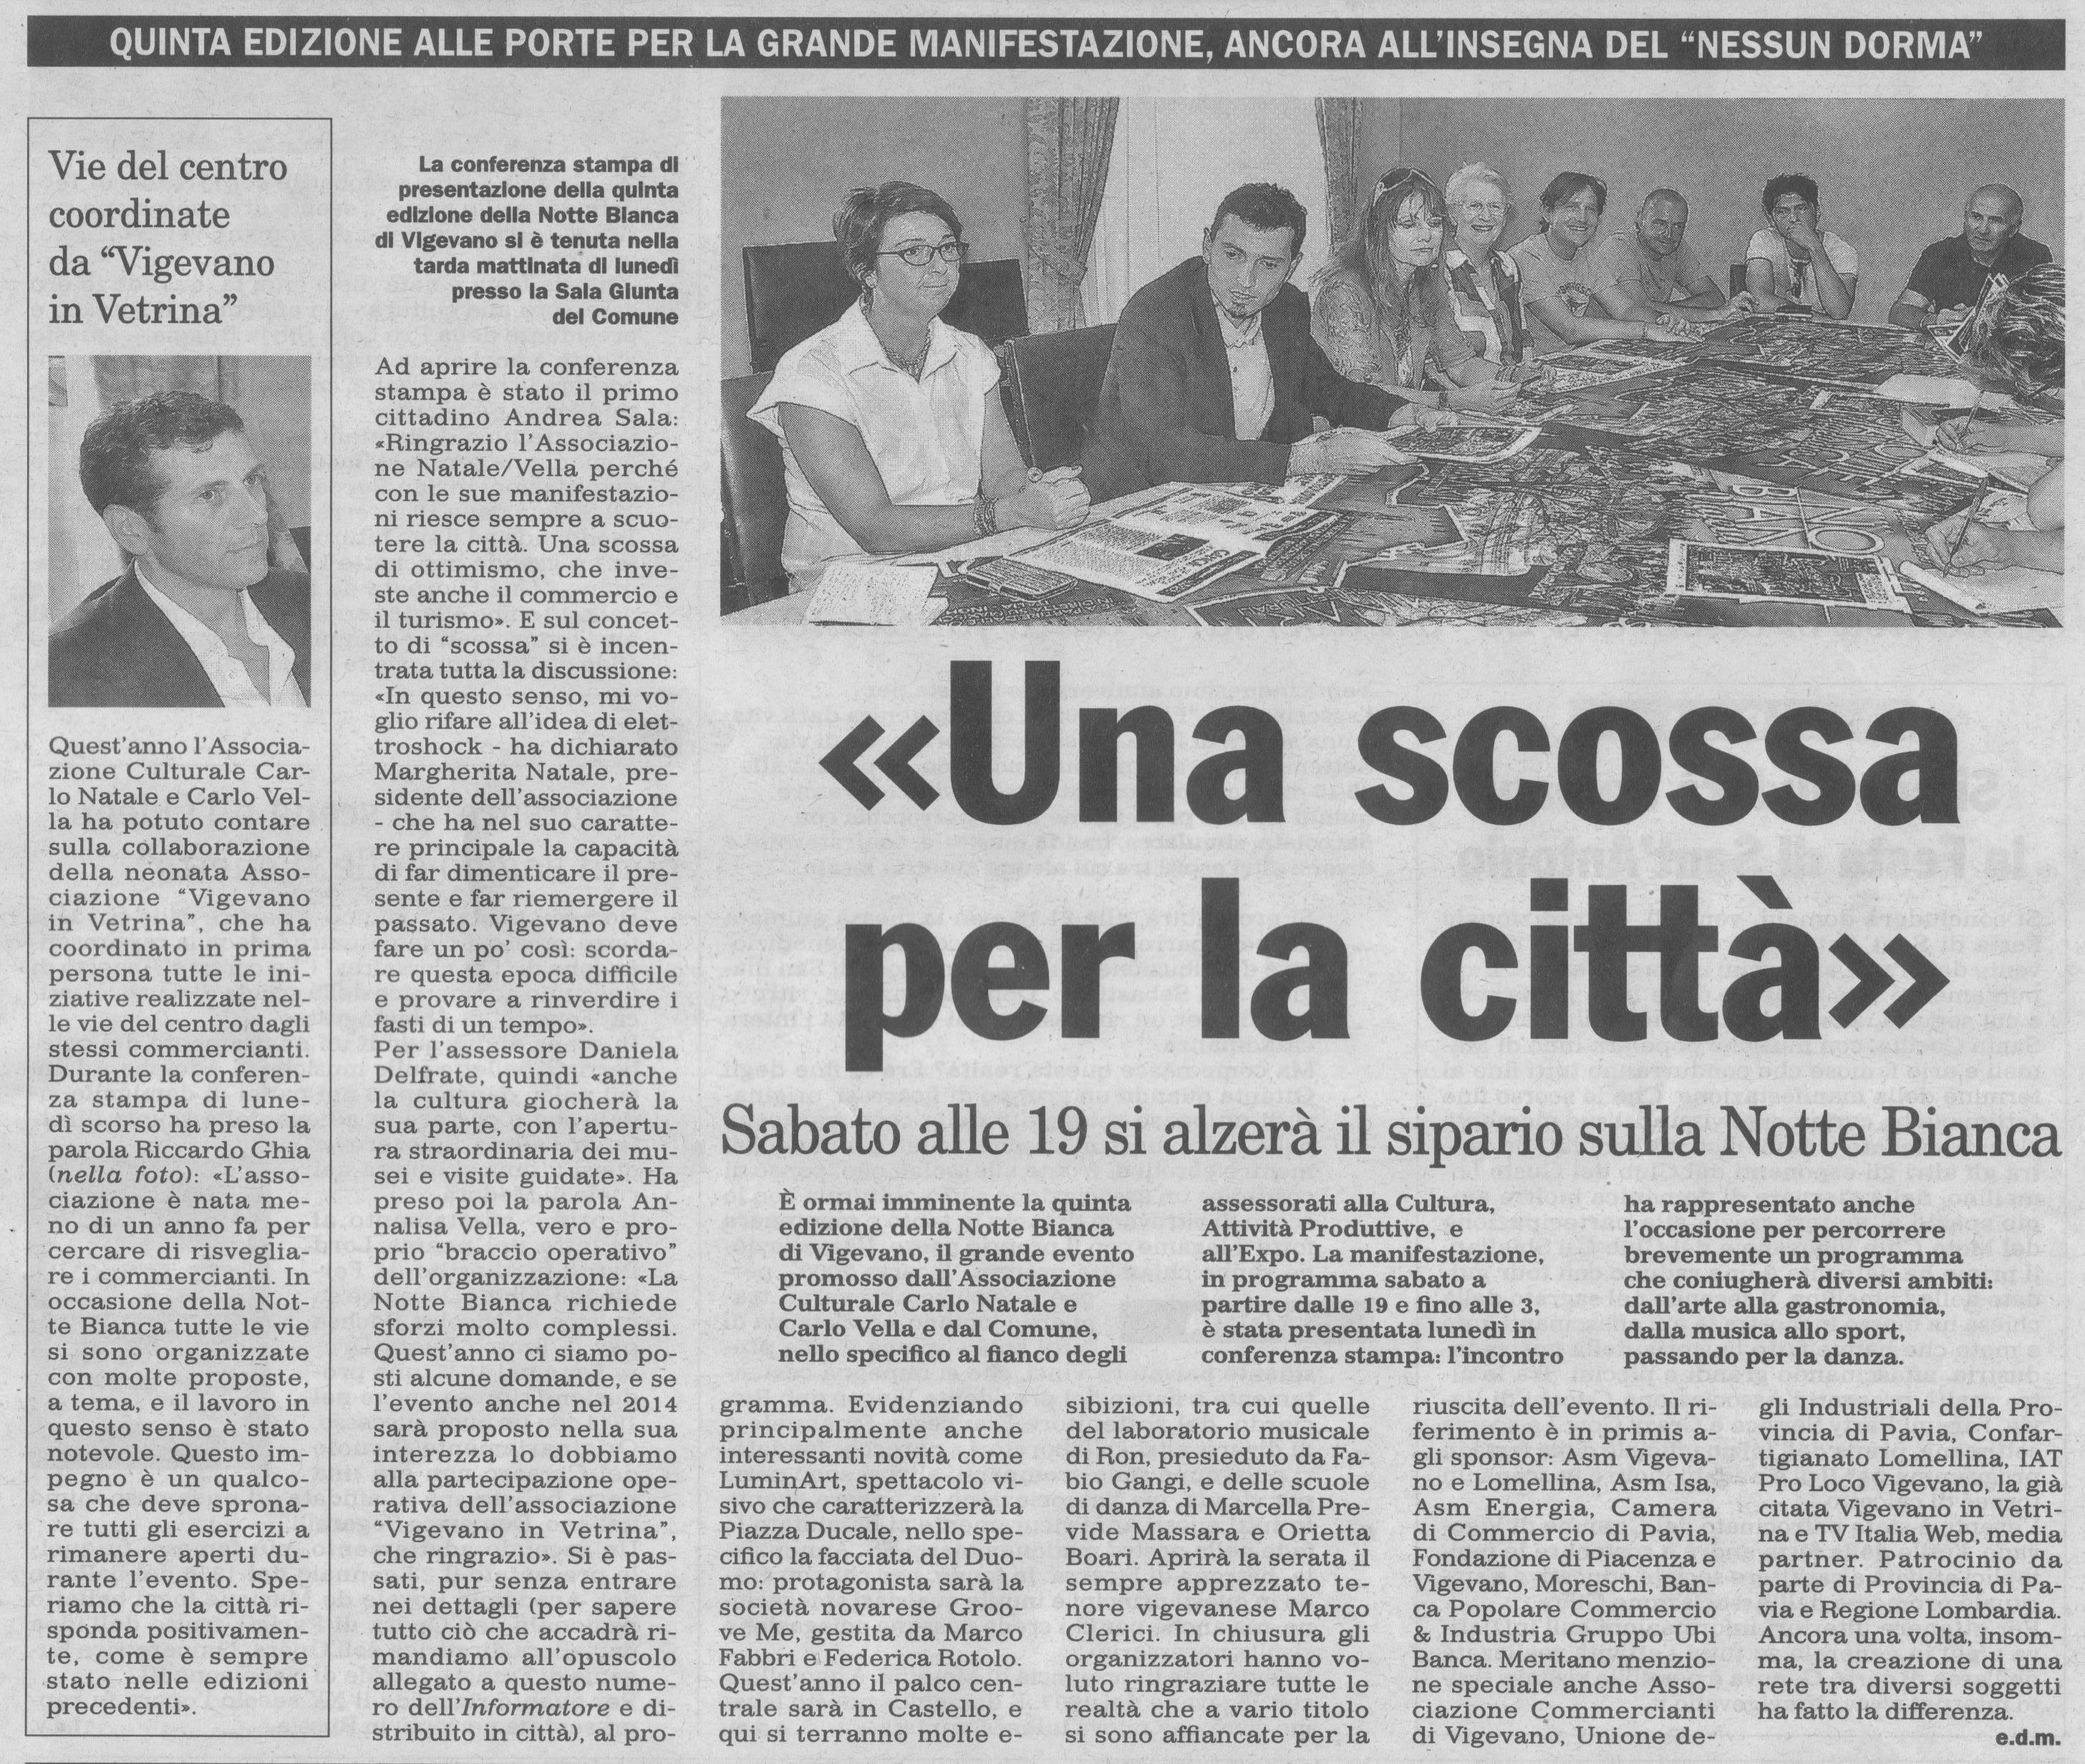 Conferenza Stampa Notte Bianca 2014 a Vigevano